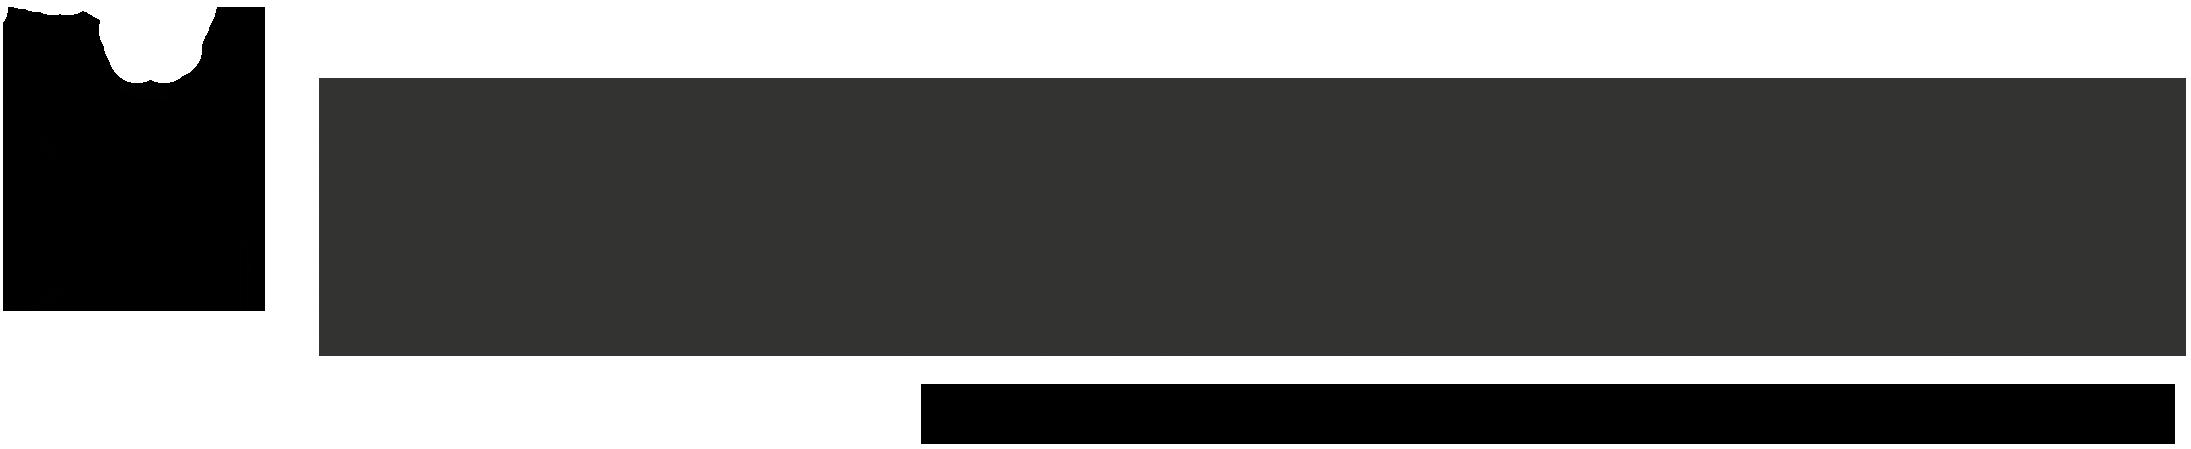 Mazilique